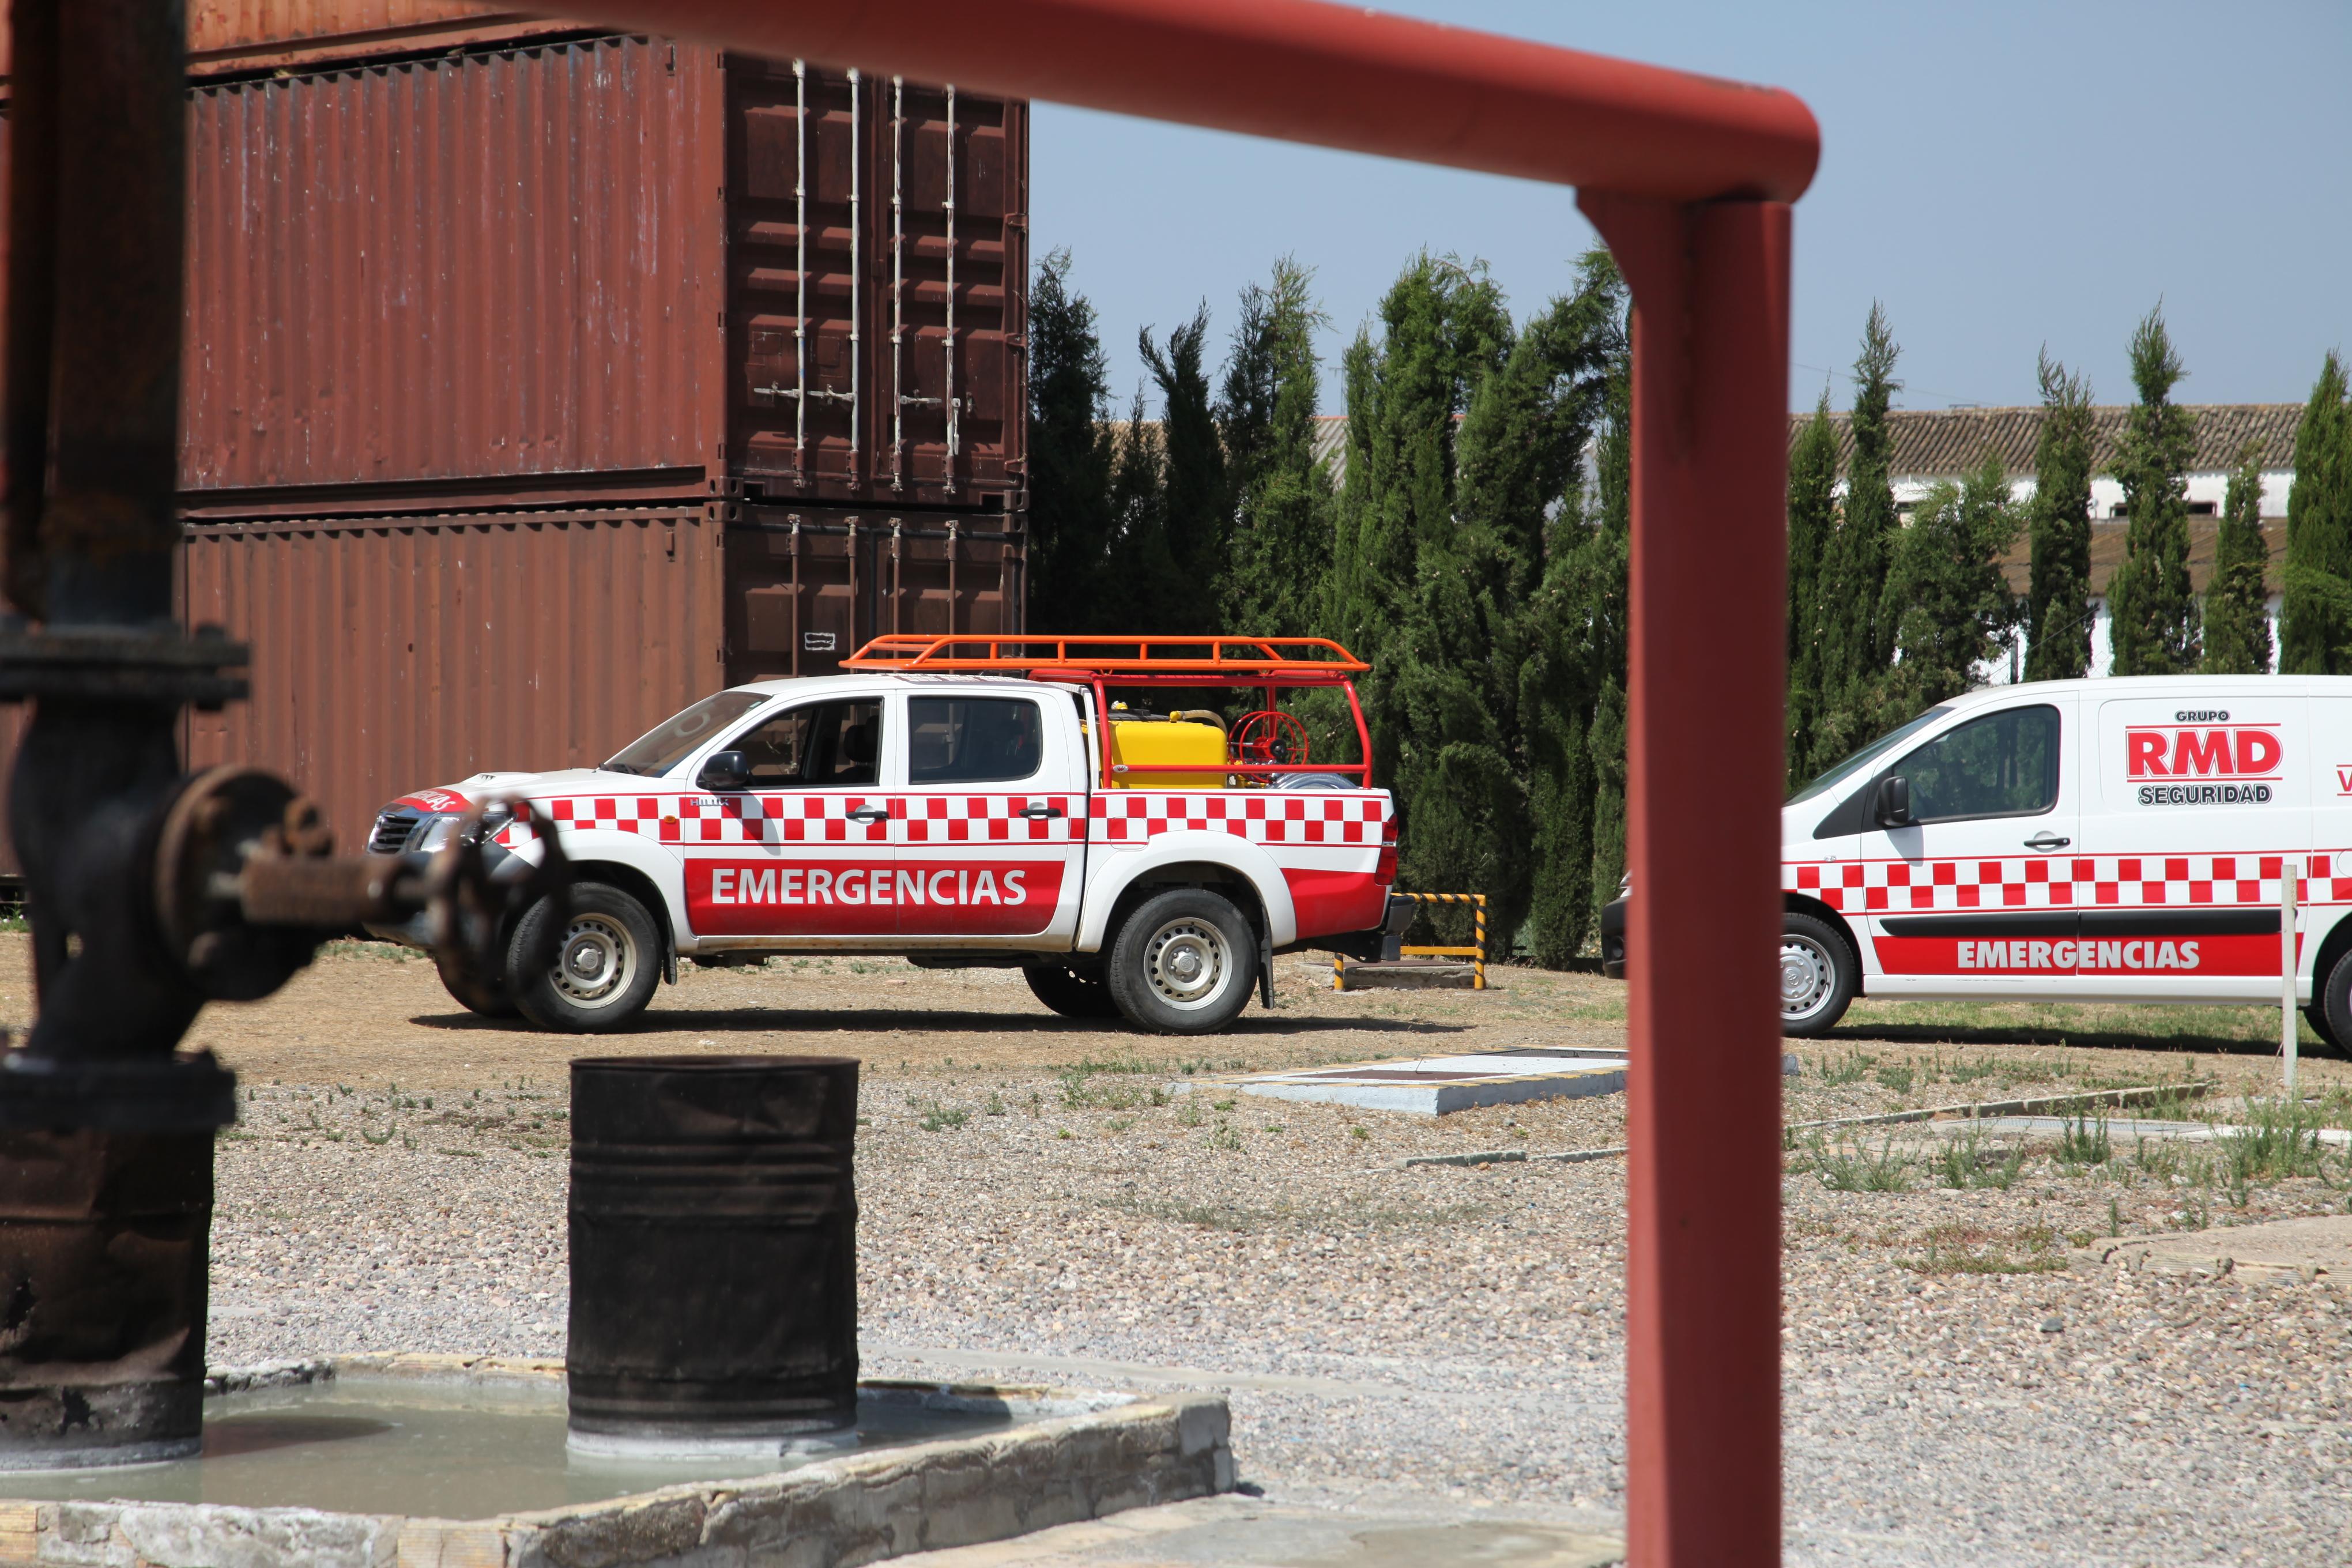 Vehiculos Emergencias RMD